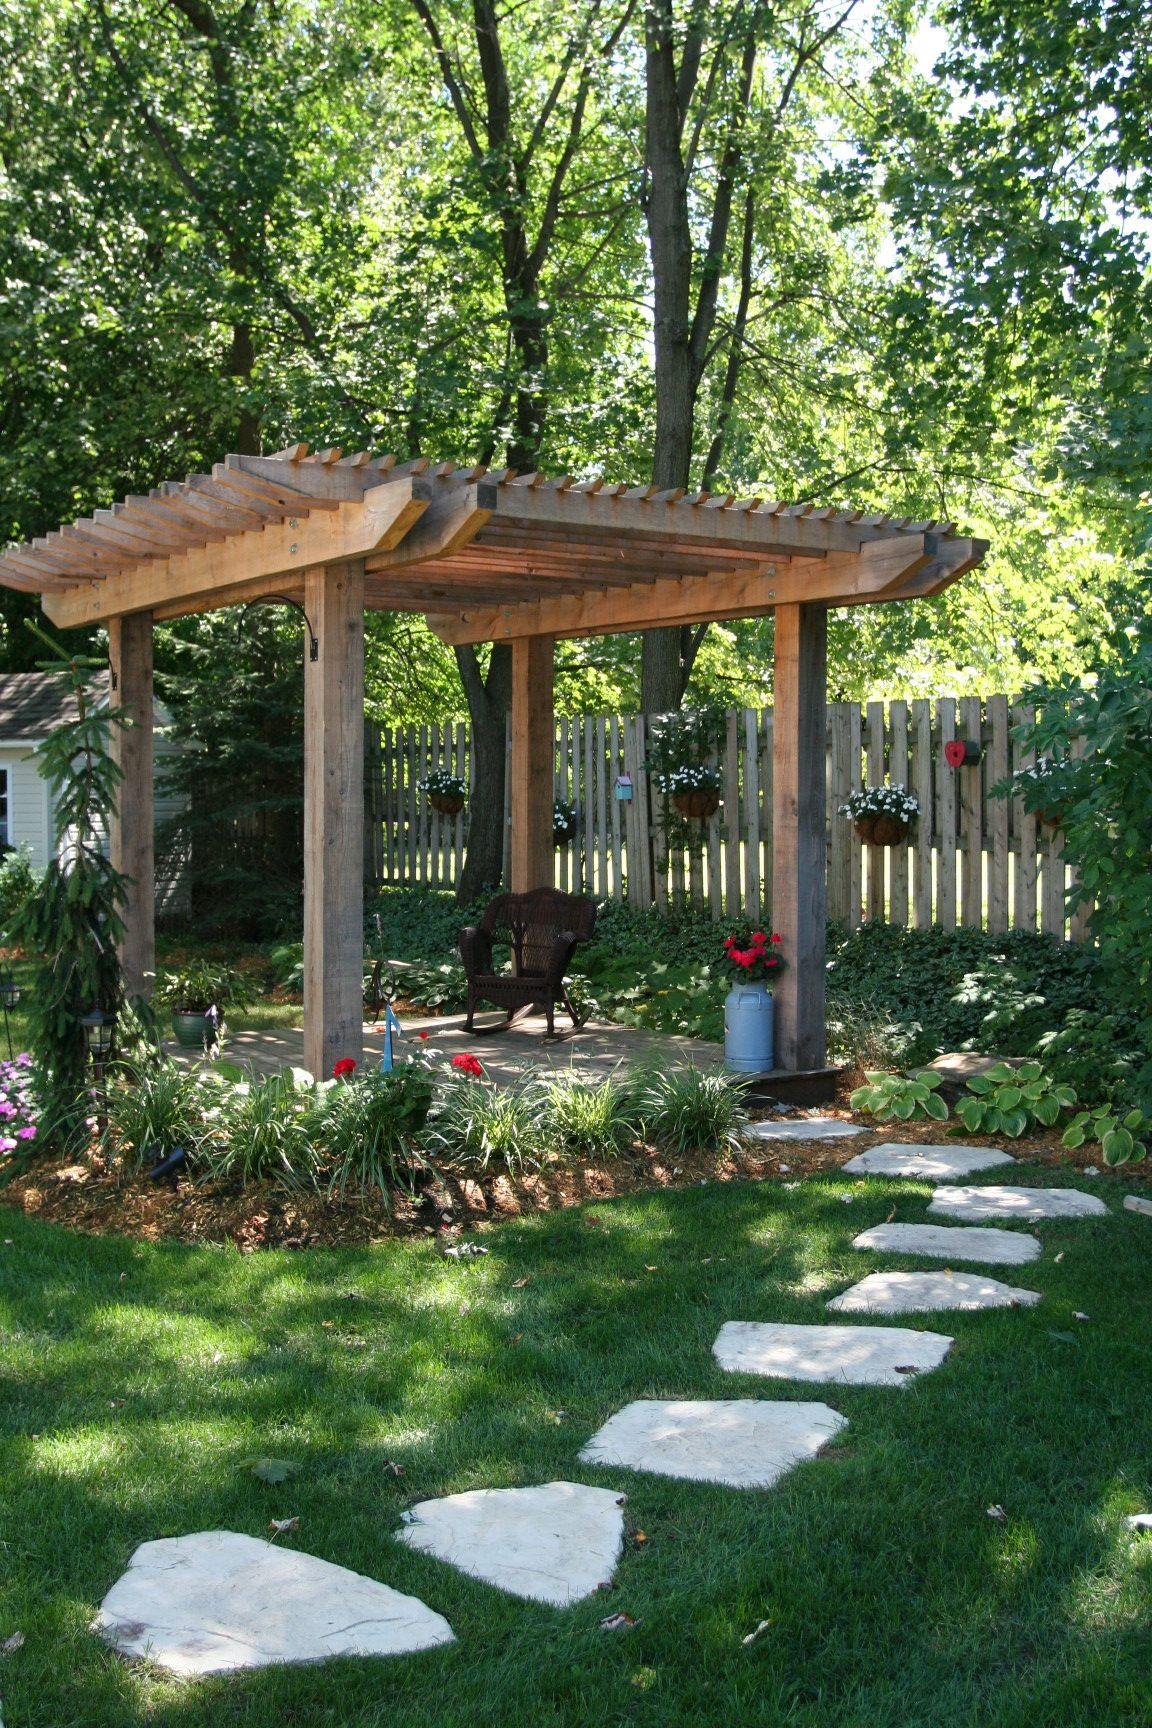 Attirant Image Result For Small Japanese Garden Pergola